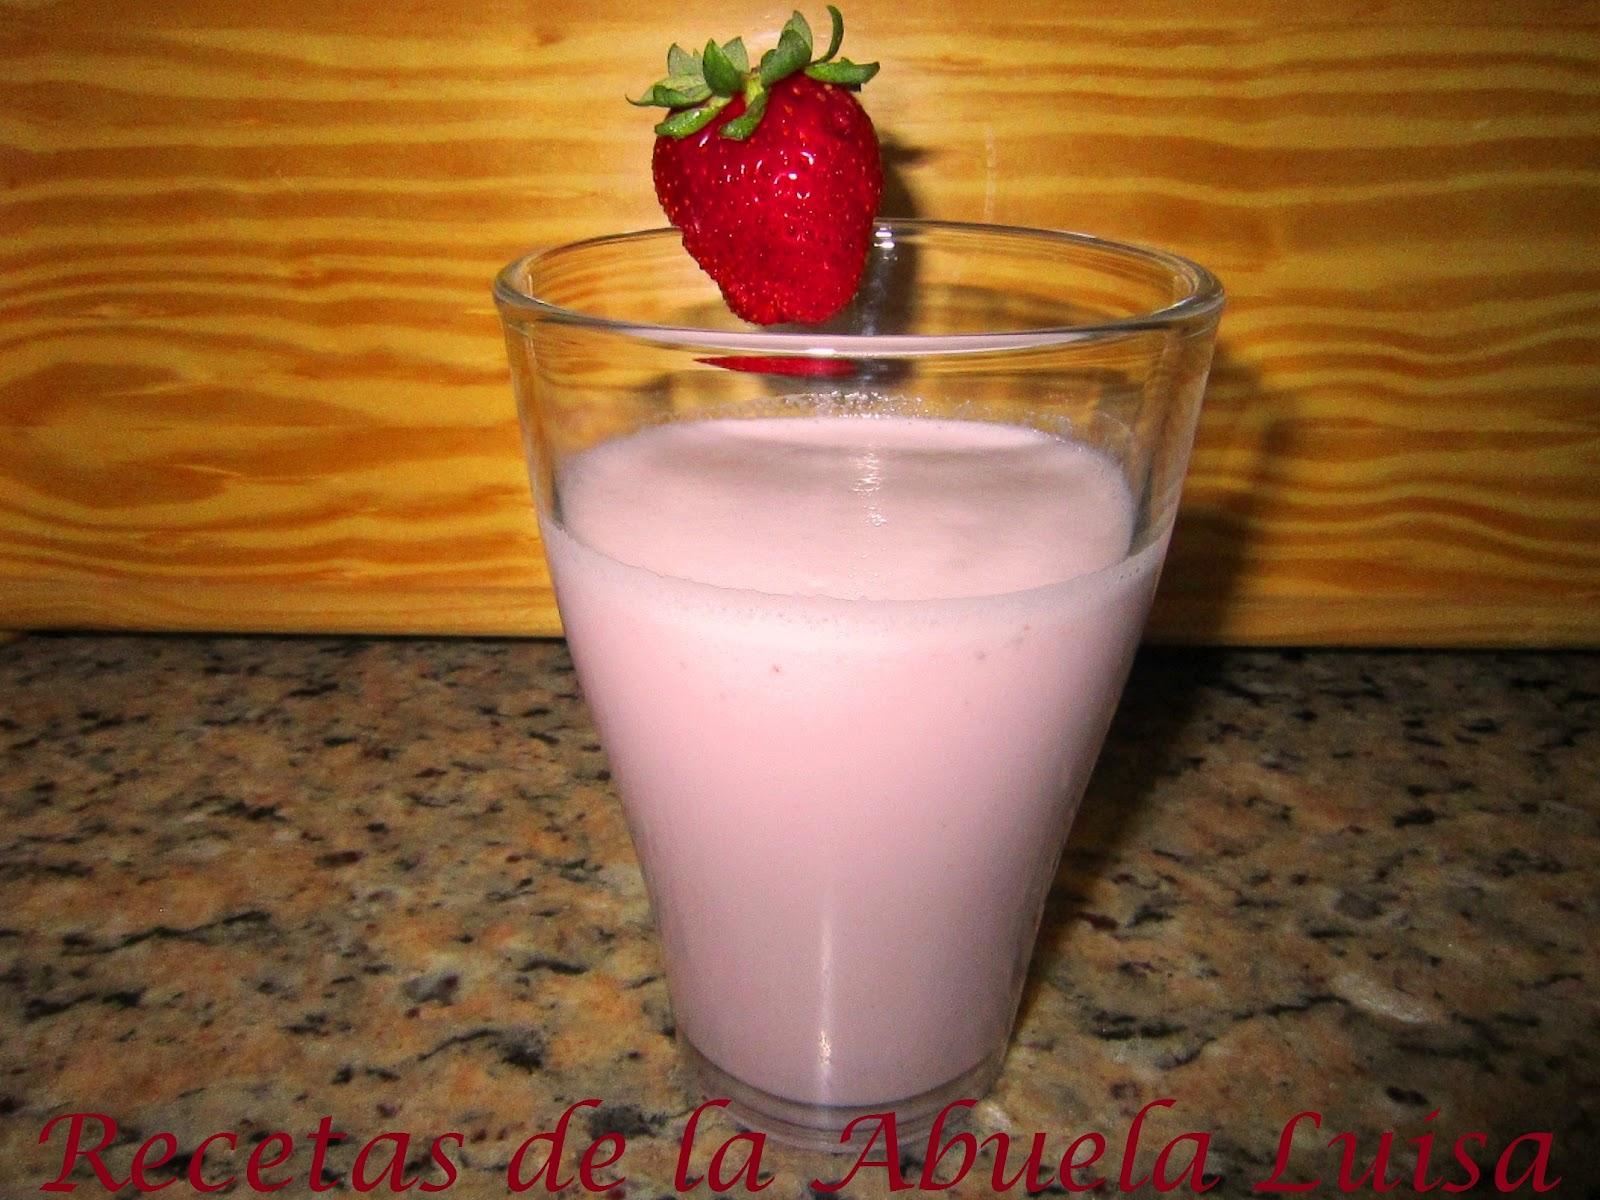 Abuela toma leche - 2 10